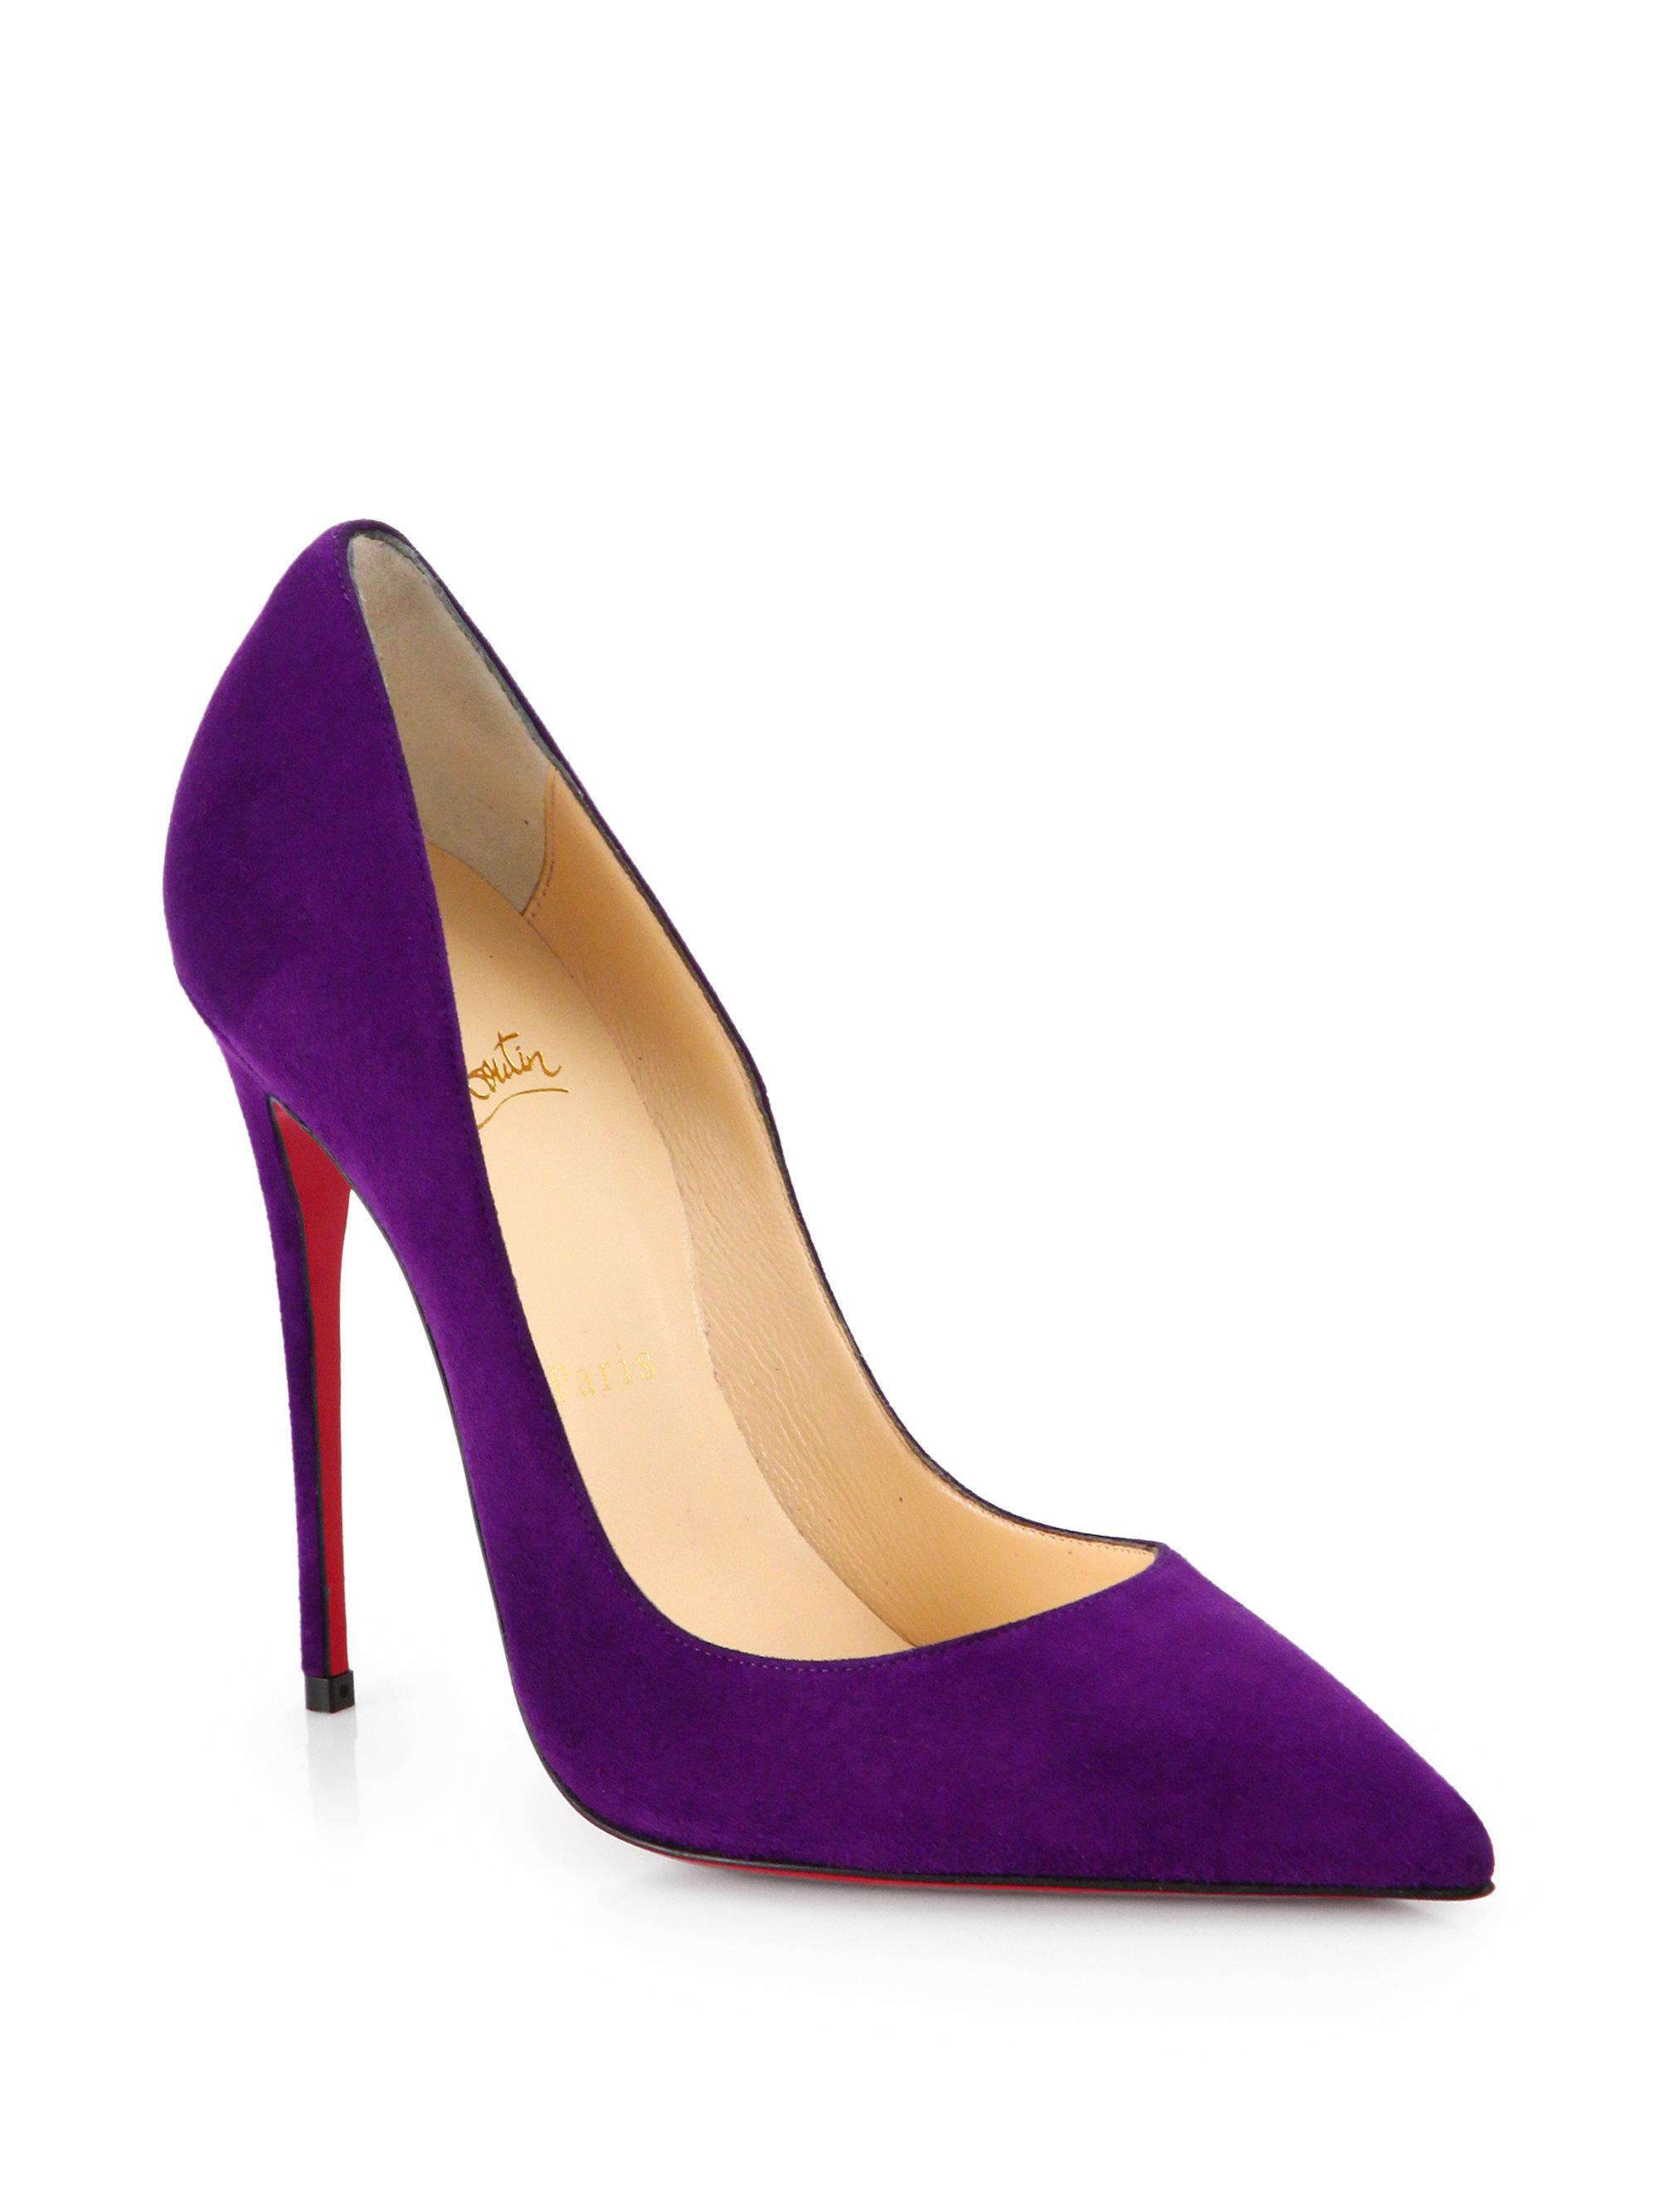 Purple Christian Louboutin